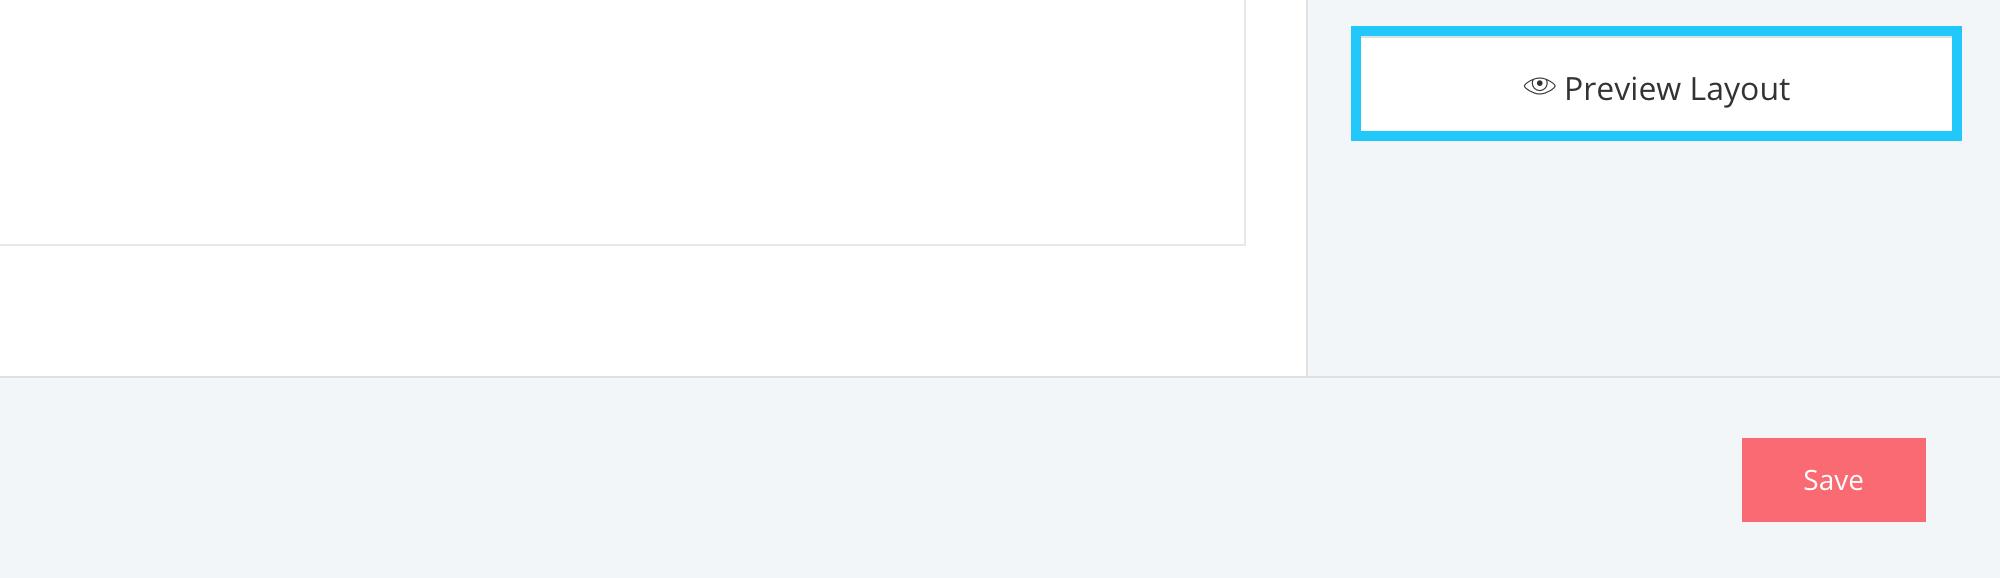 ConvertKitのEメールテンプレートをプレビューPreview Layoutする